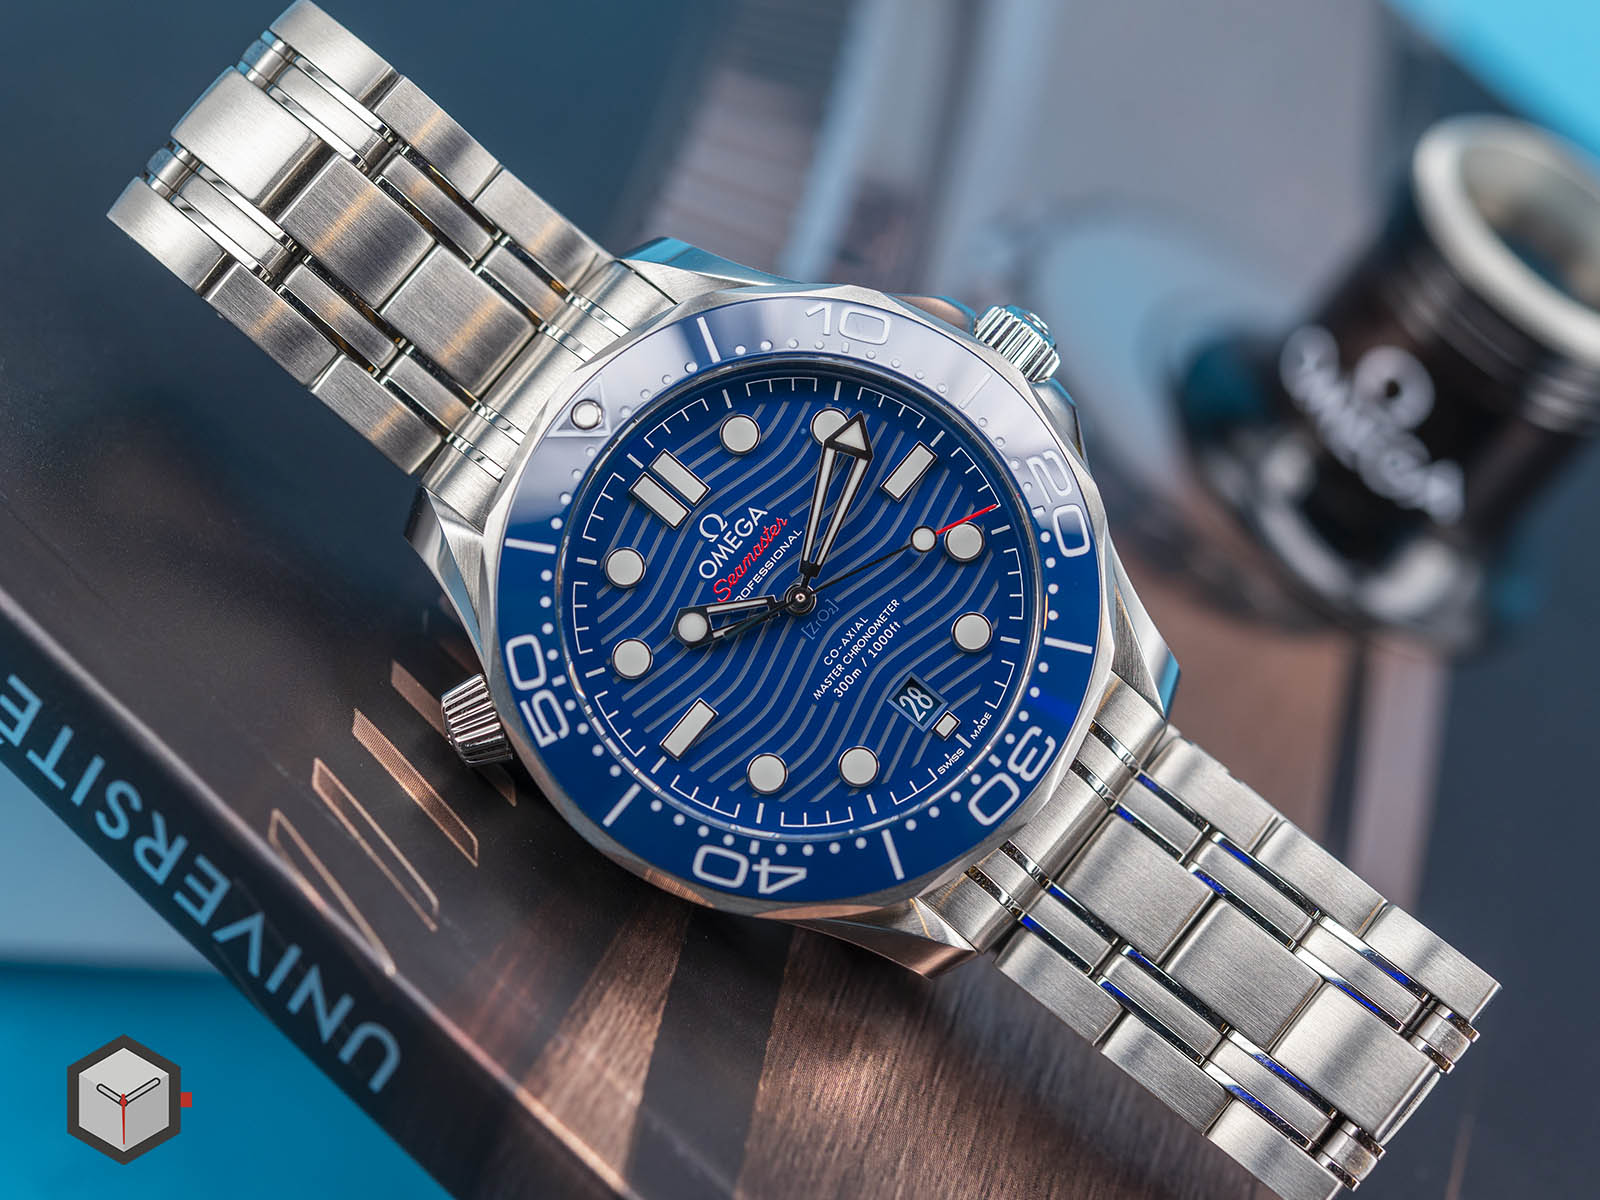 210-30-42-20-03-001-omega-seamaster-professional-diver-300m-5.jpg